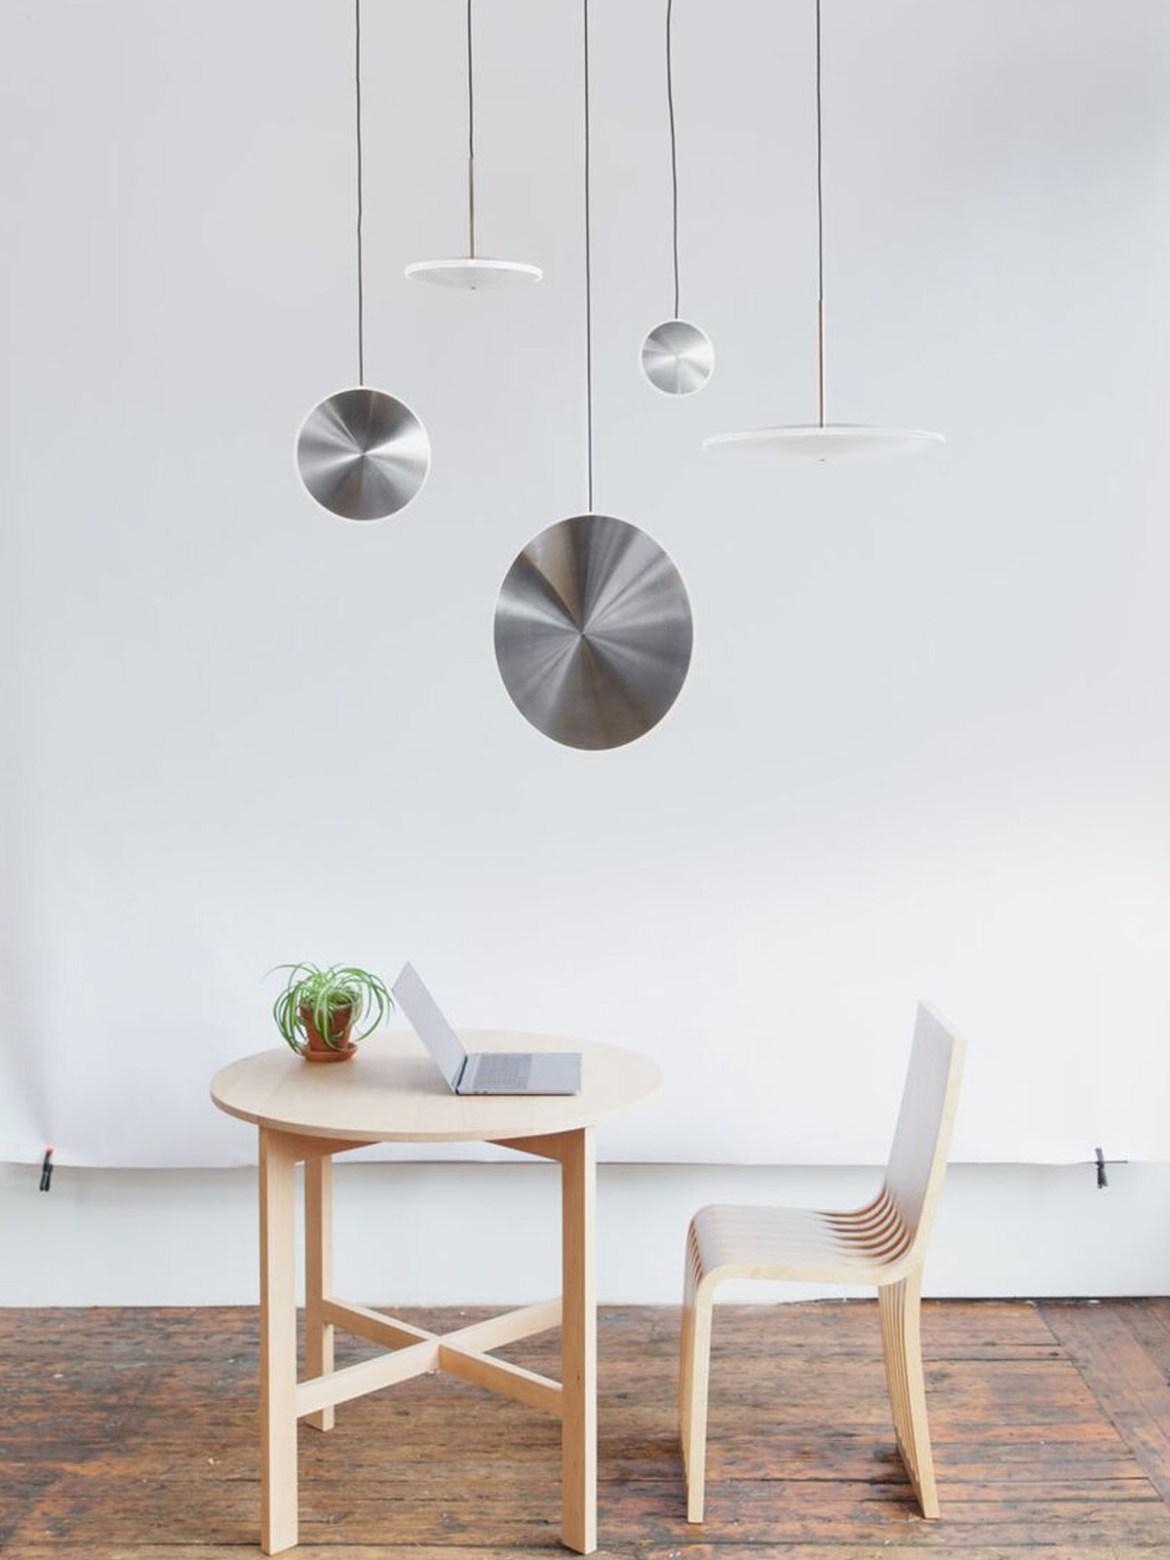 DesignOrt Blog: Lampen Trends 2019 LED Lampe aus Stahl Chronalights H Graypants